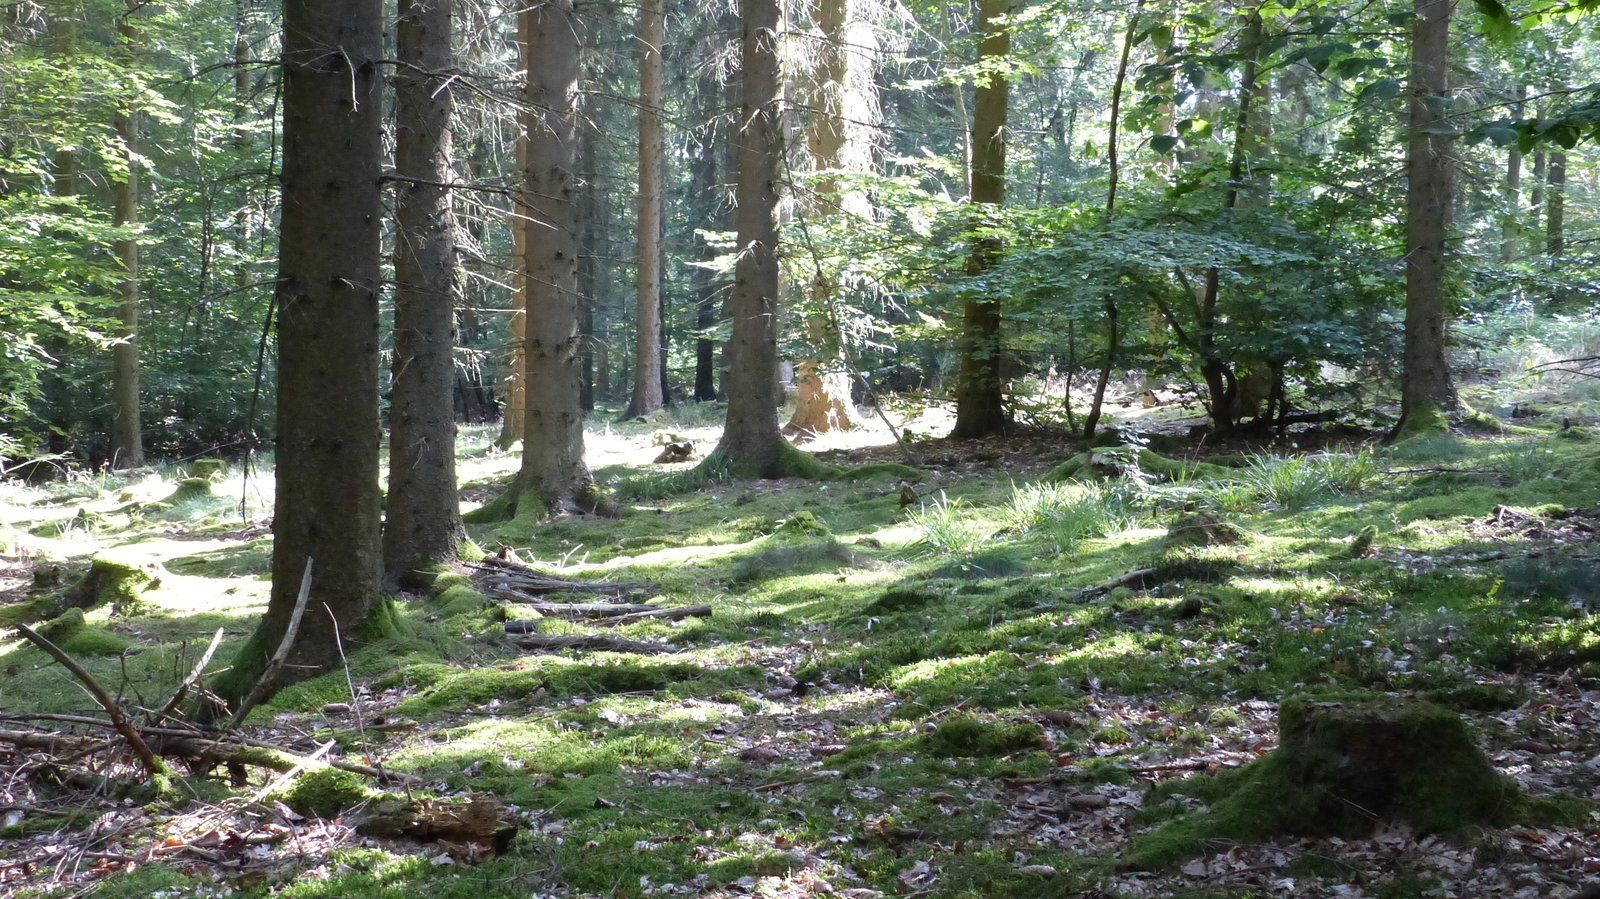 Nationalpark Hunsrück-Hochwald – Bloggerwandern 2019